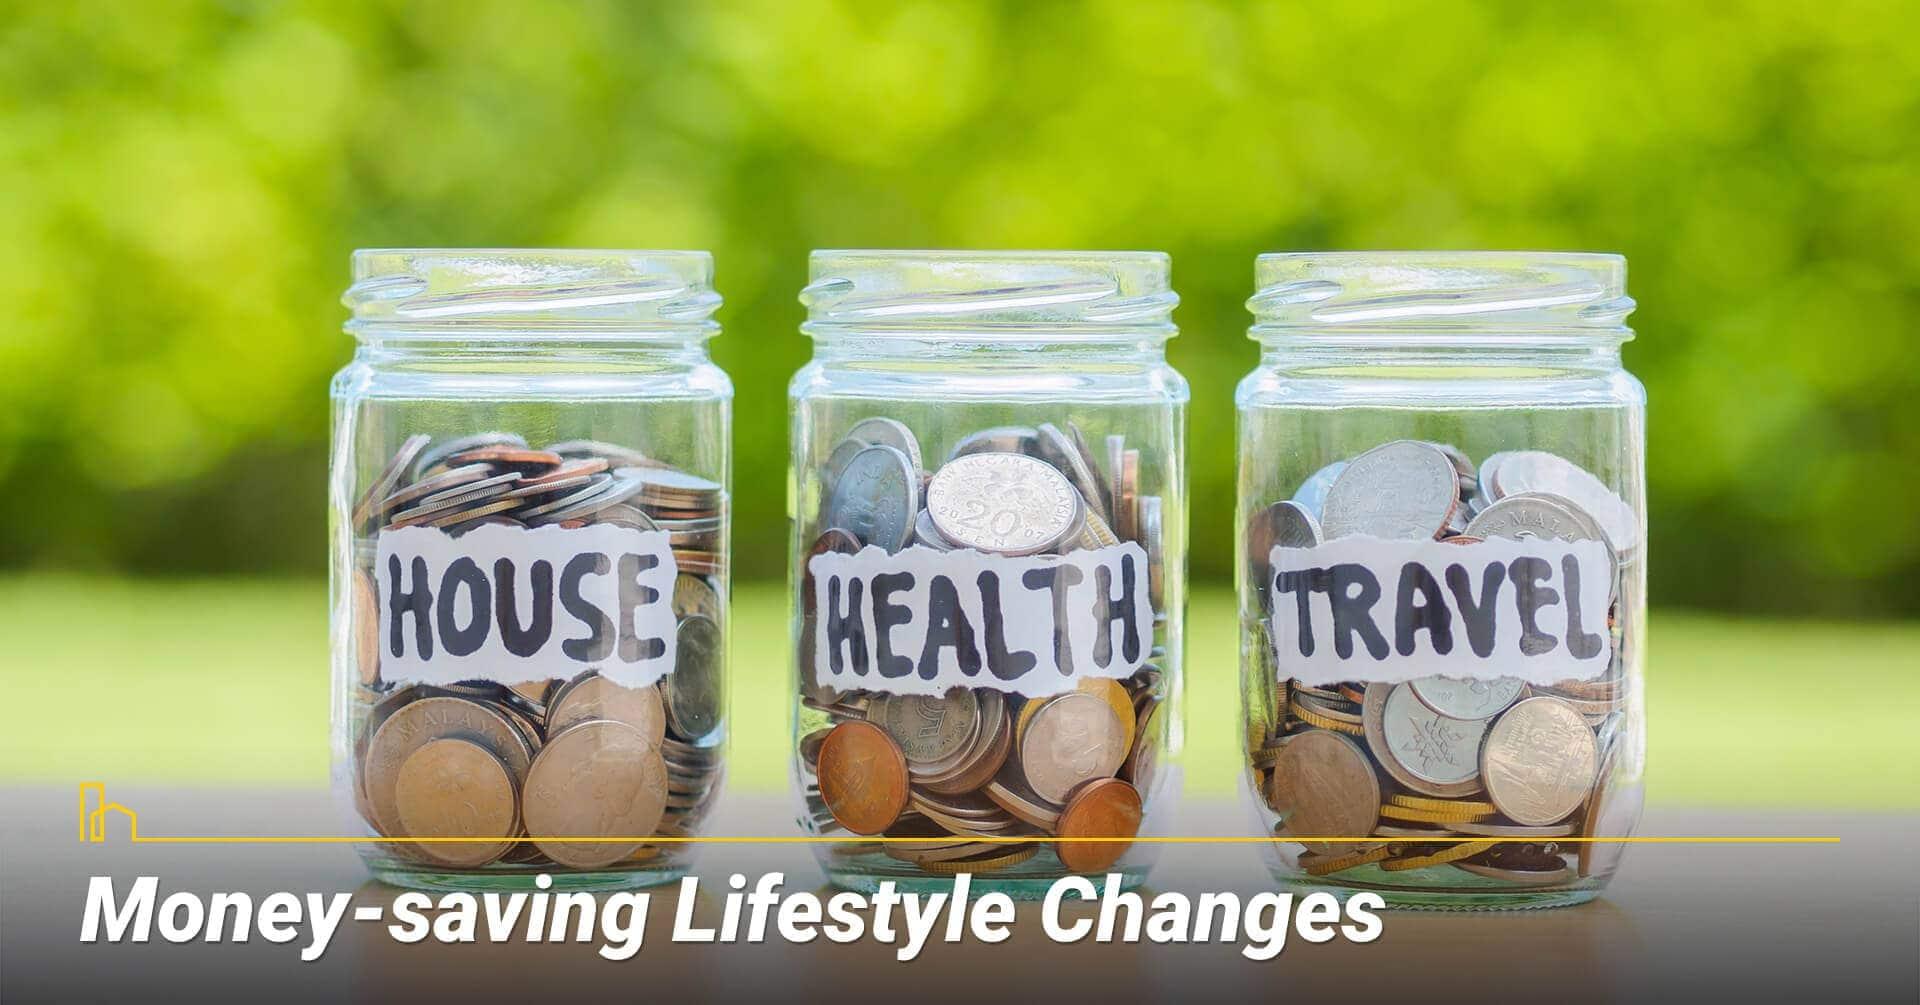 Money-saving Lifestyle Changes, change your life